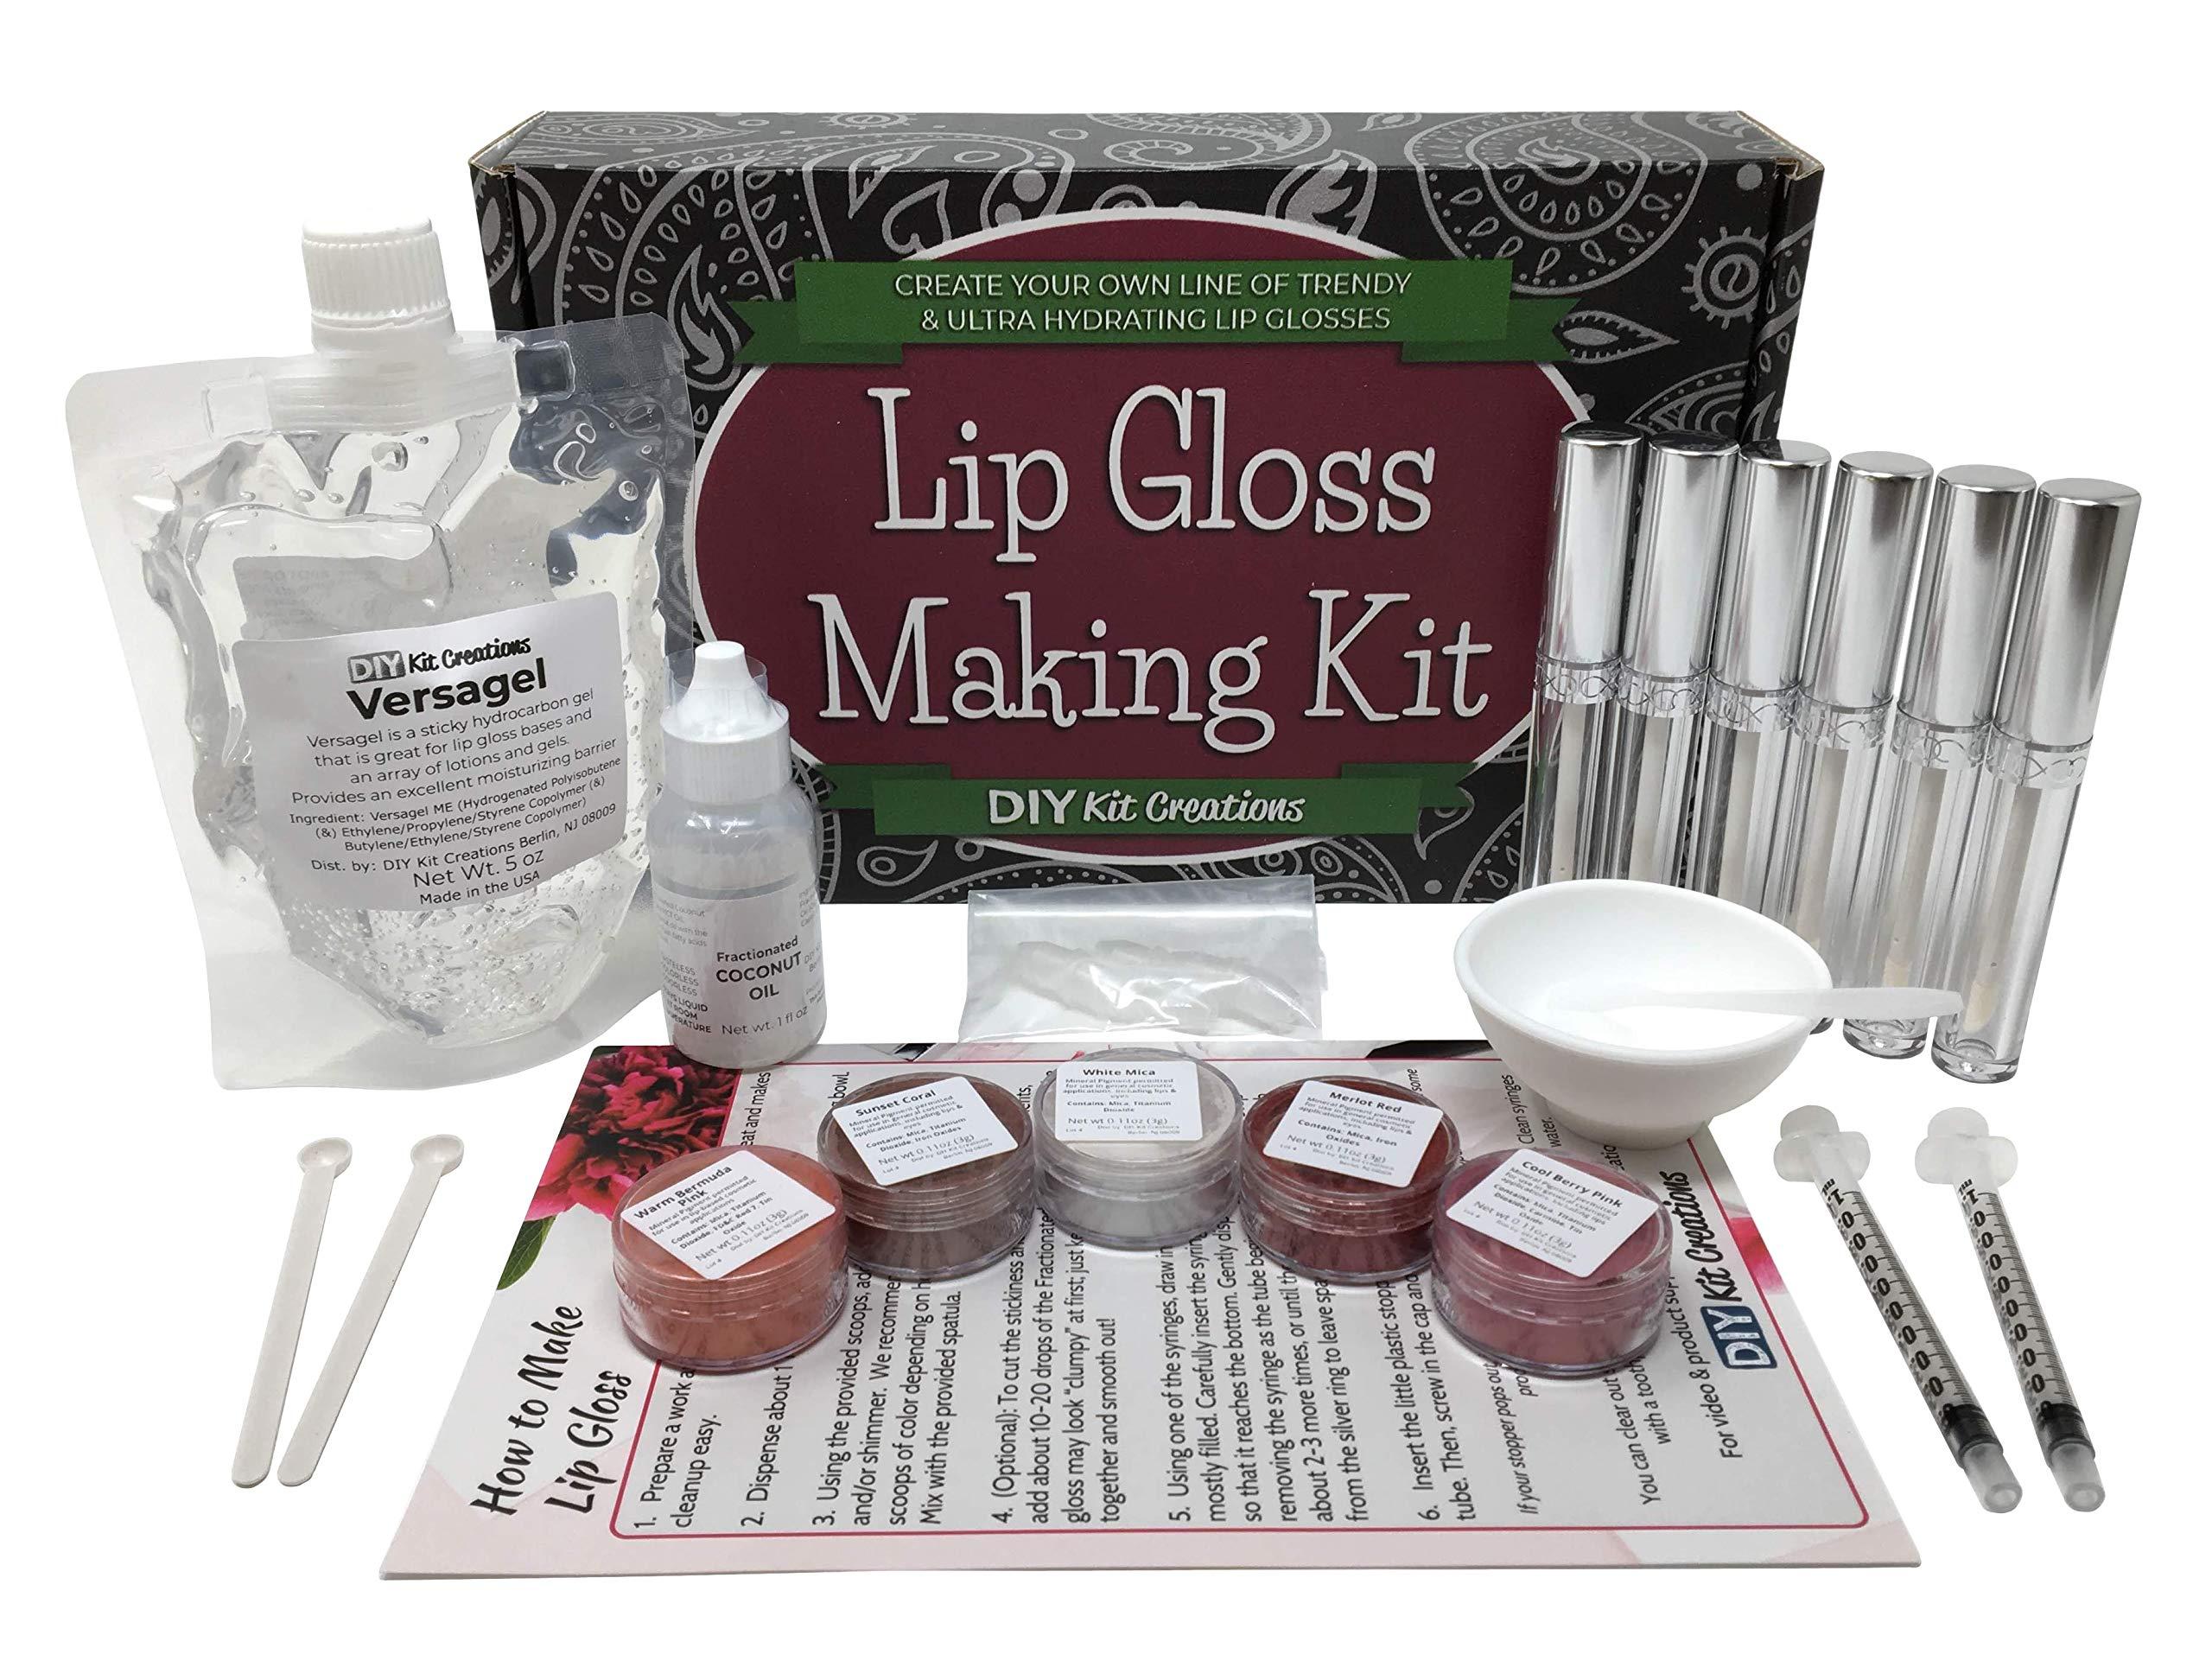 DIY Lip Gloss Making Kit - Make Your Own Lip Gloss by DIY Kit Creations (Image #1)